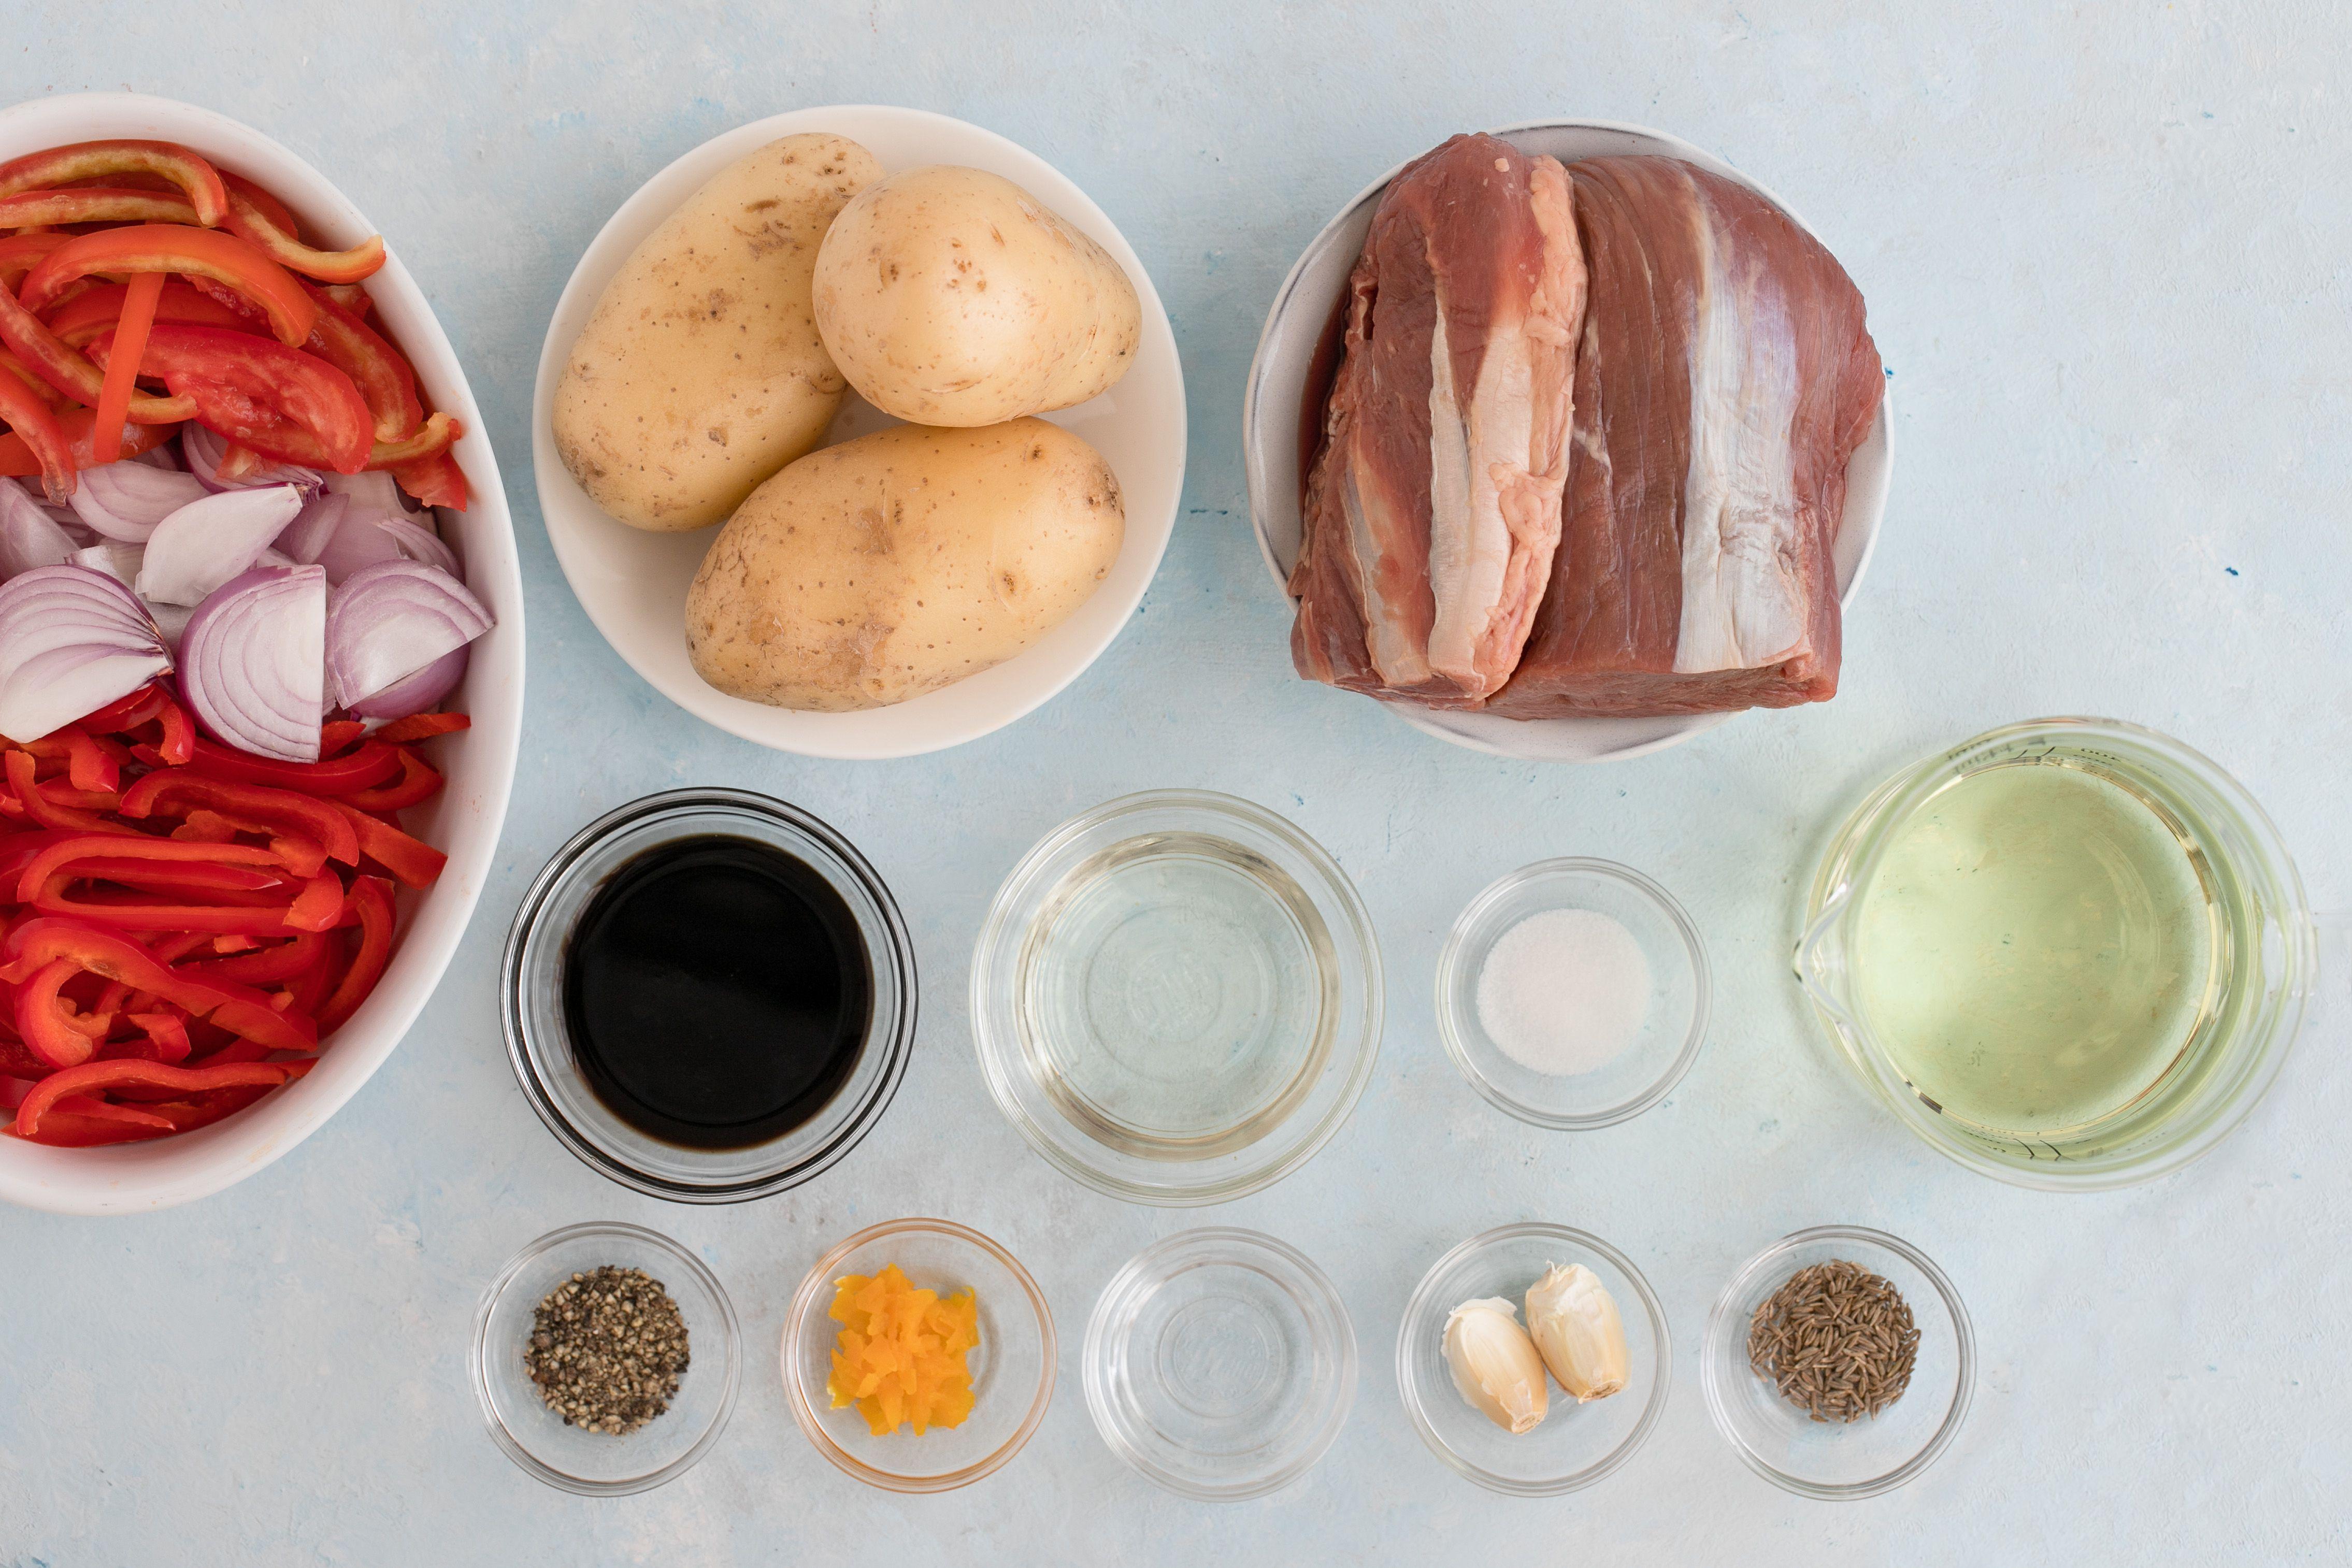 Ingredients for lomo saltado stir fried beef potatoes